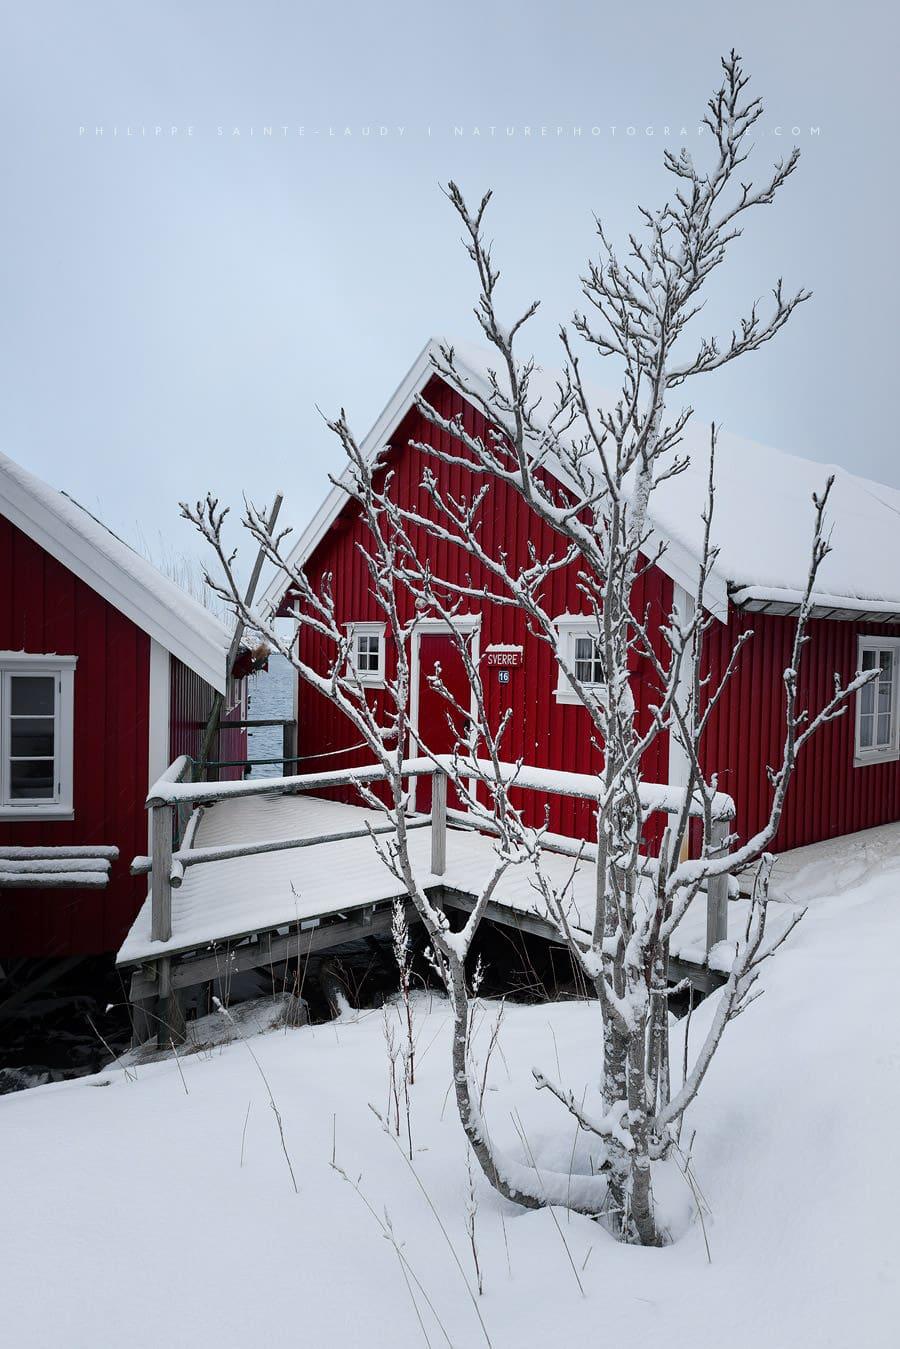 Norvegian Red Cabin